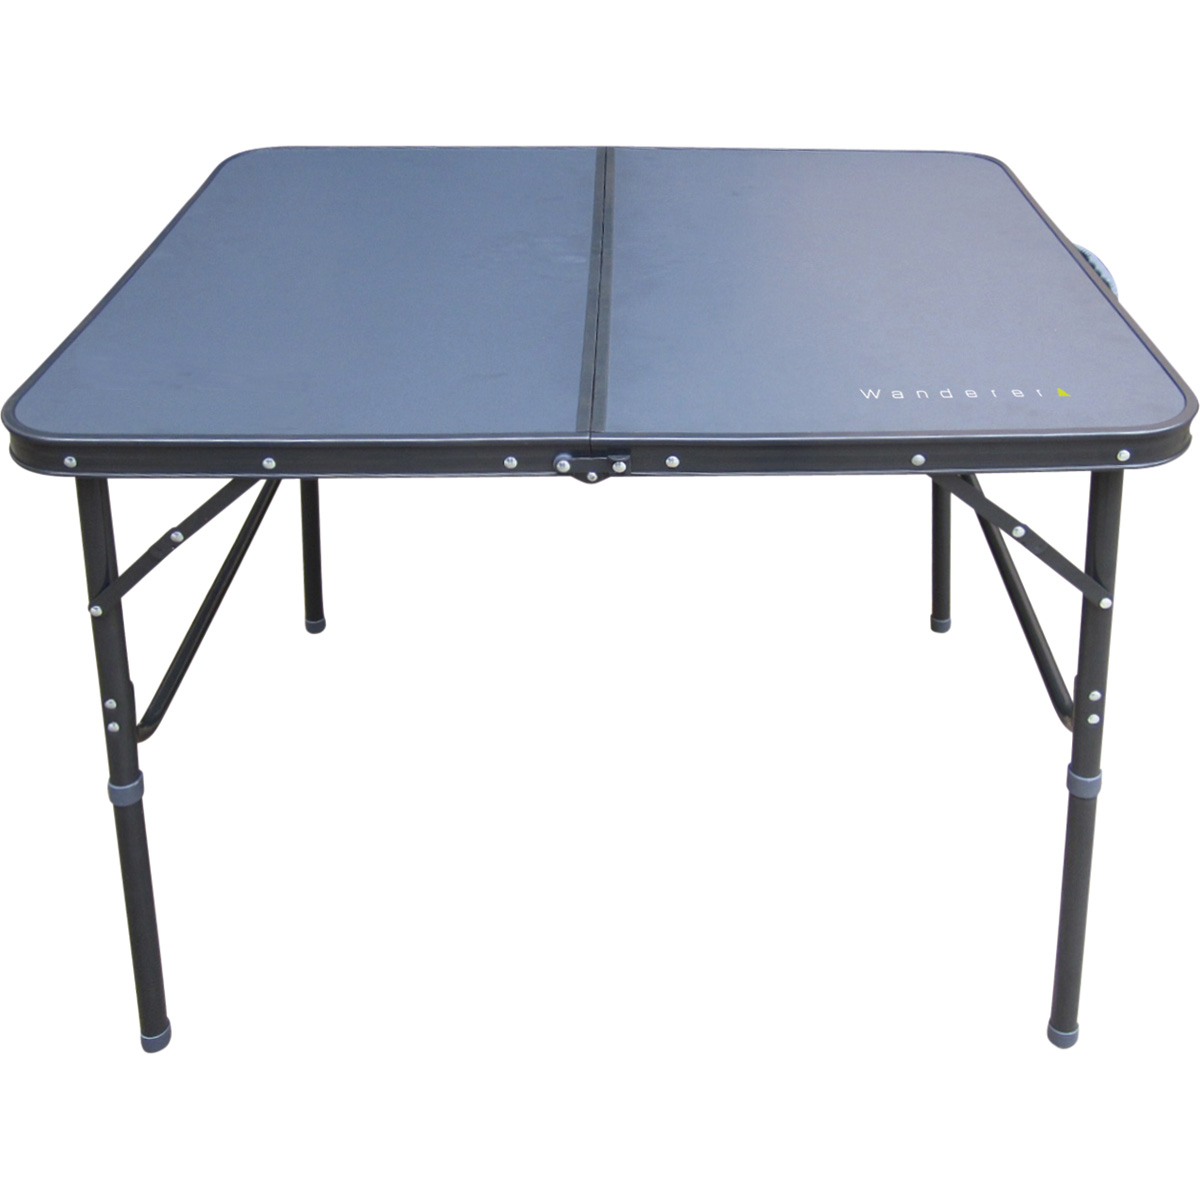 Wanderer Aluminium Folding Table pertaining to dimensions 1200 X 1200